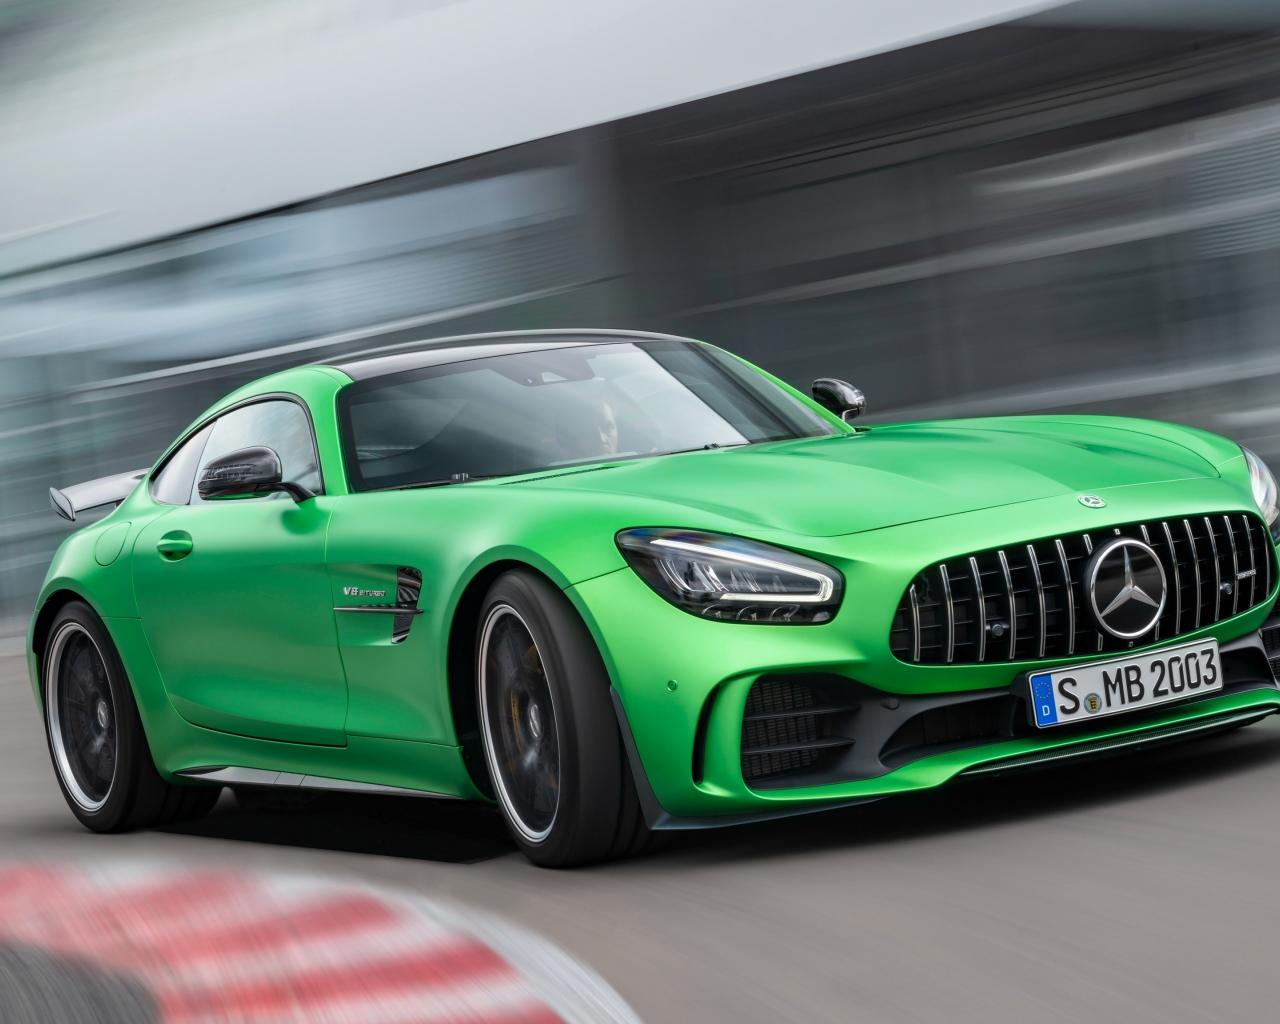 Mercedes-AMG GT, green car, on-road, 1280x1024 wallpaper